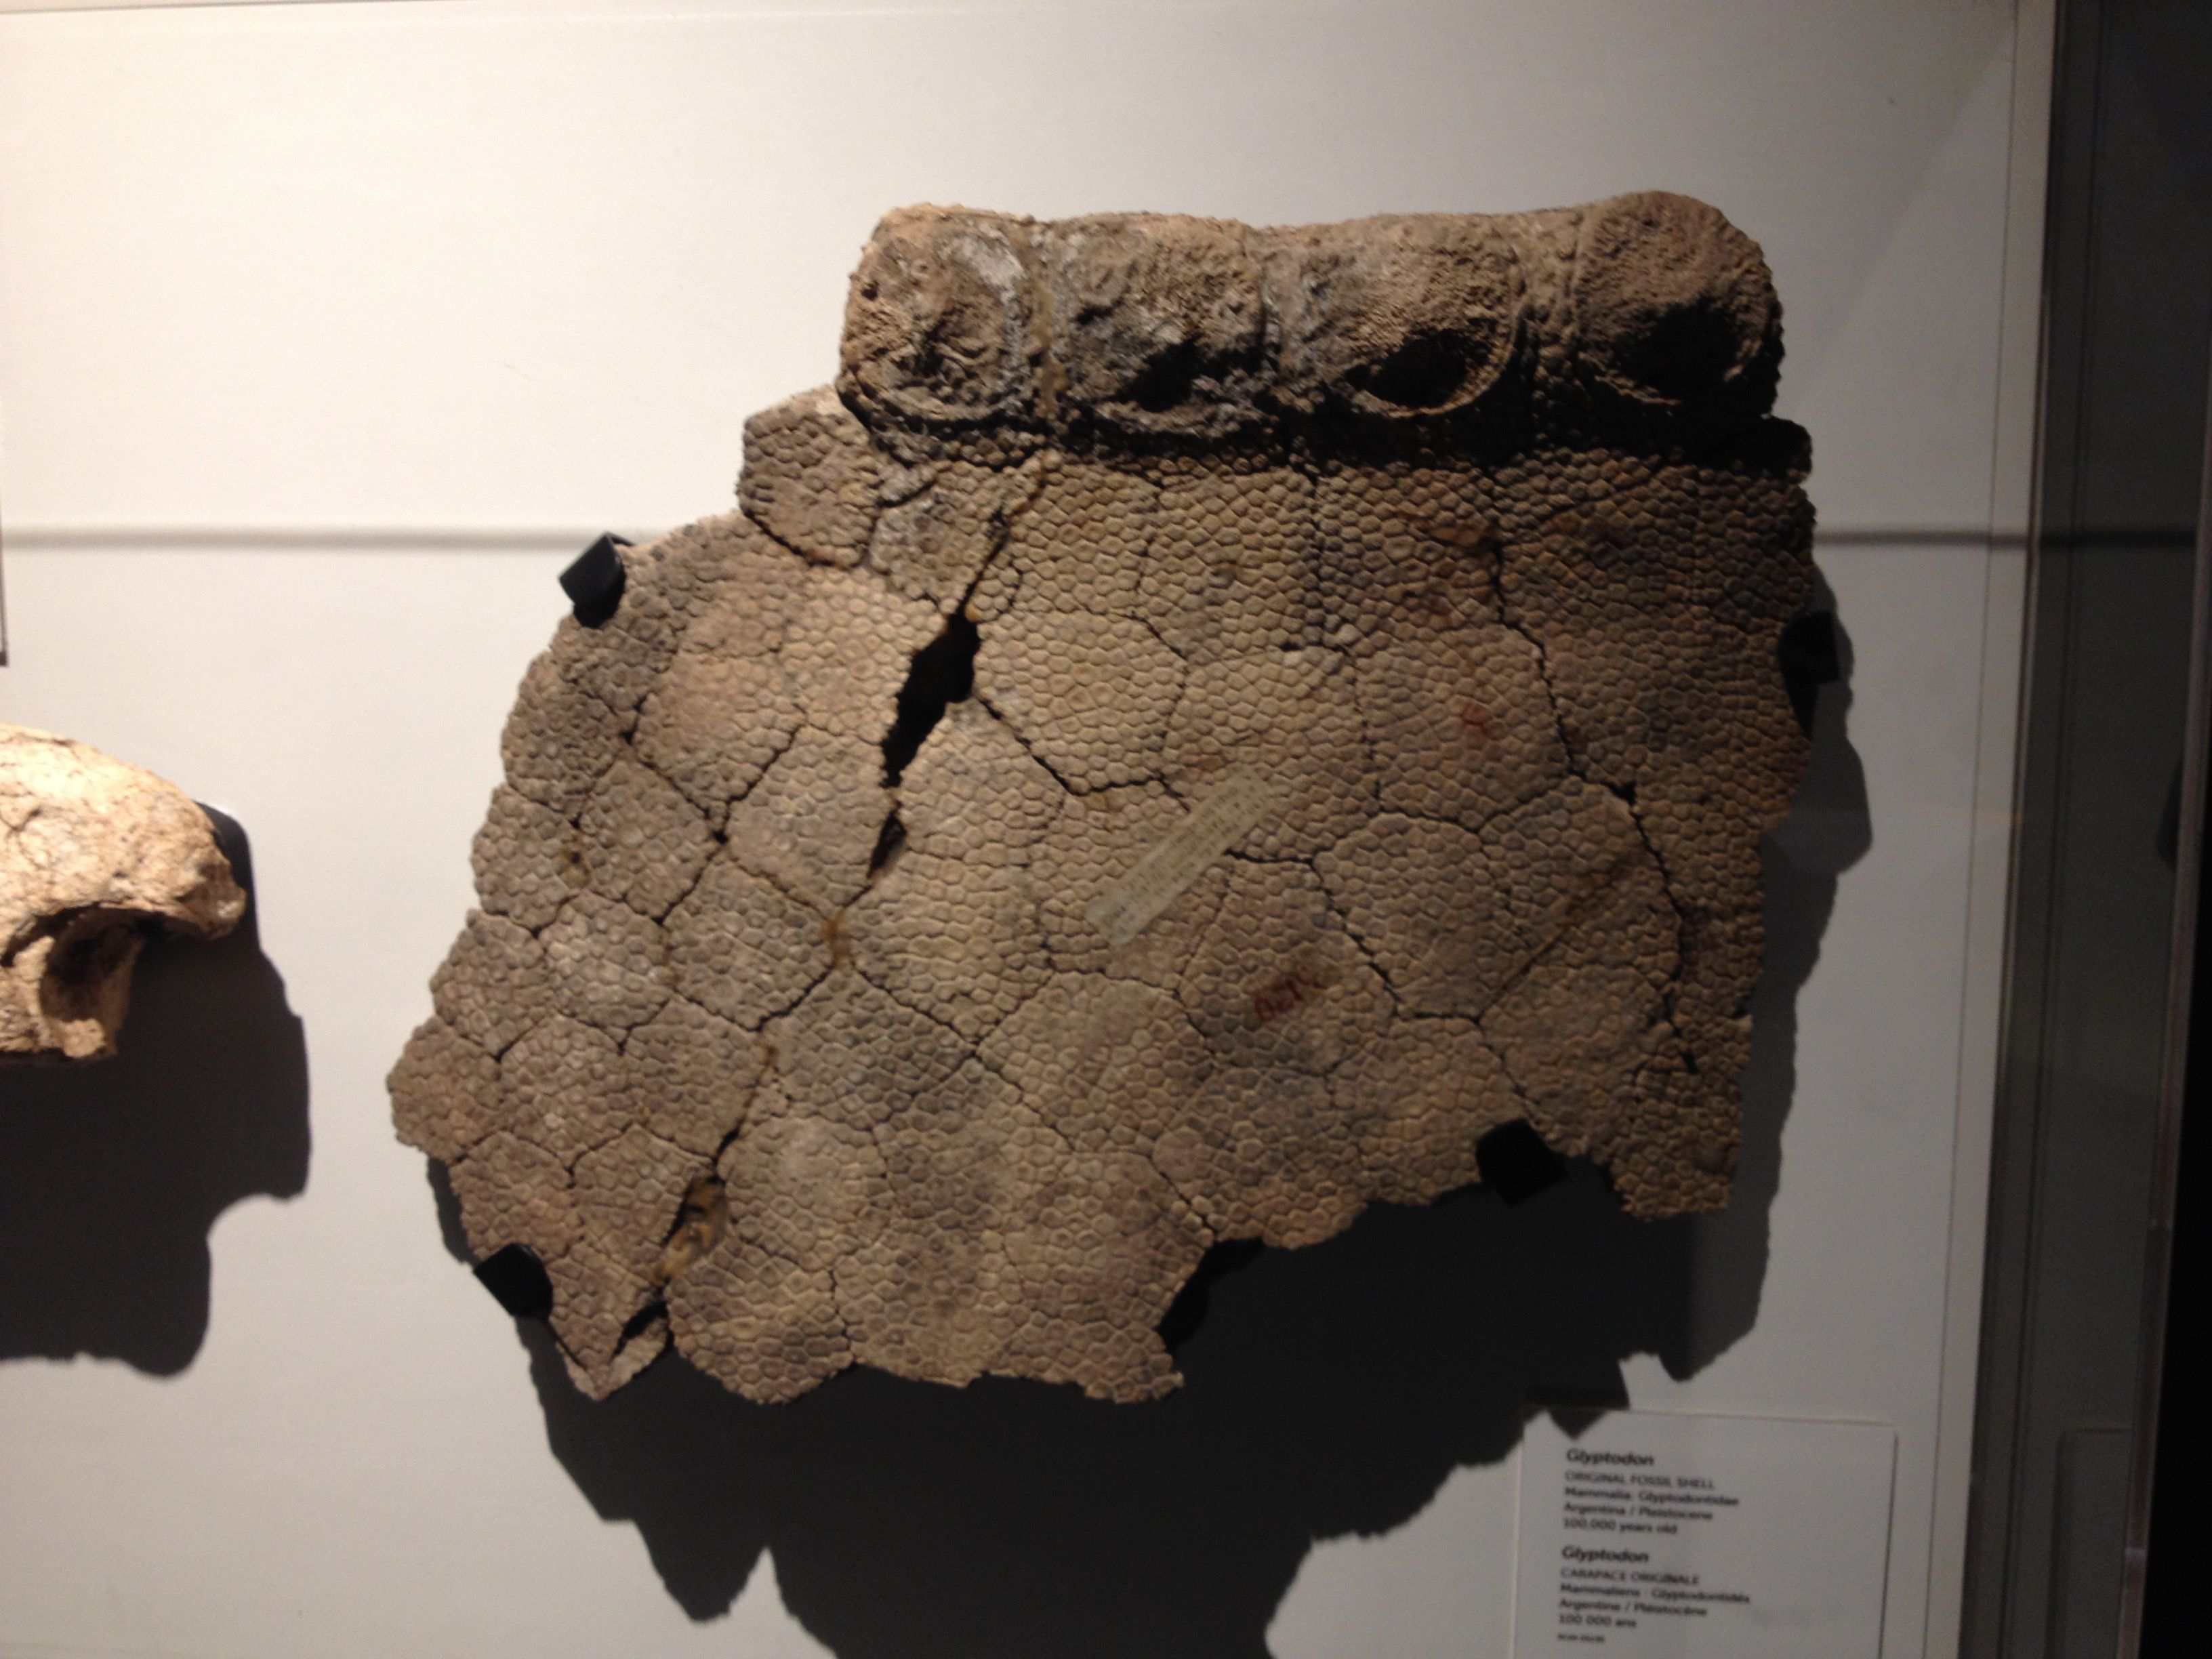 Glyptodont Fossil Shell Ultimate Dinosaurs Exhibit